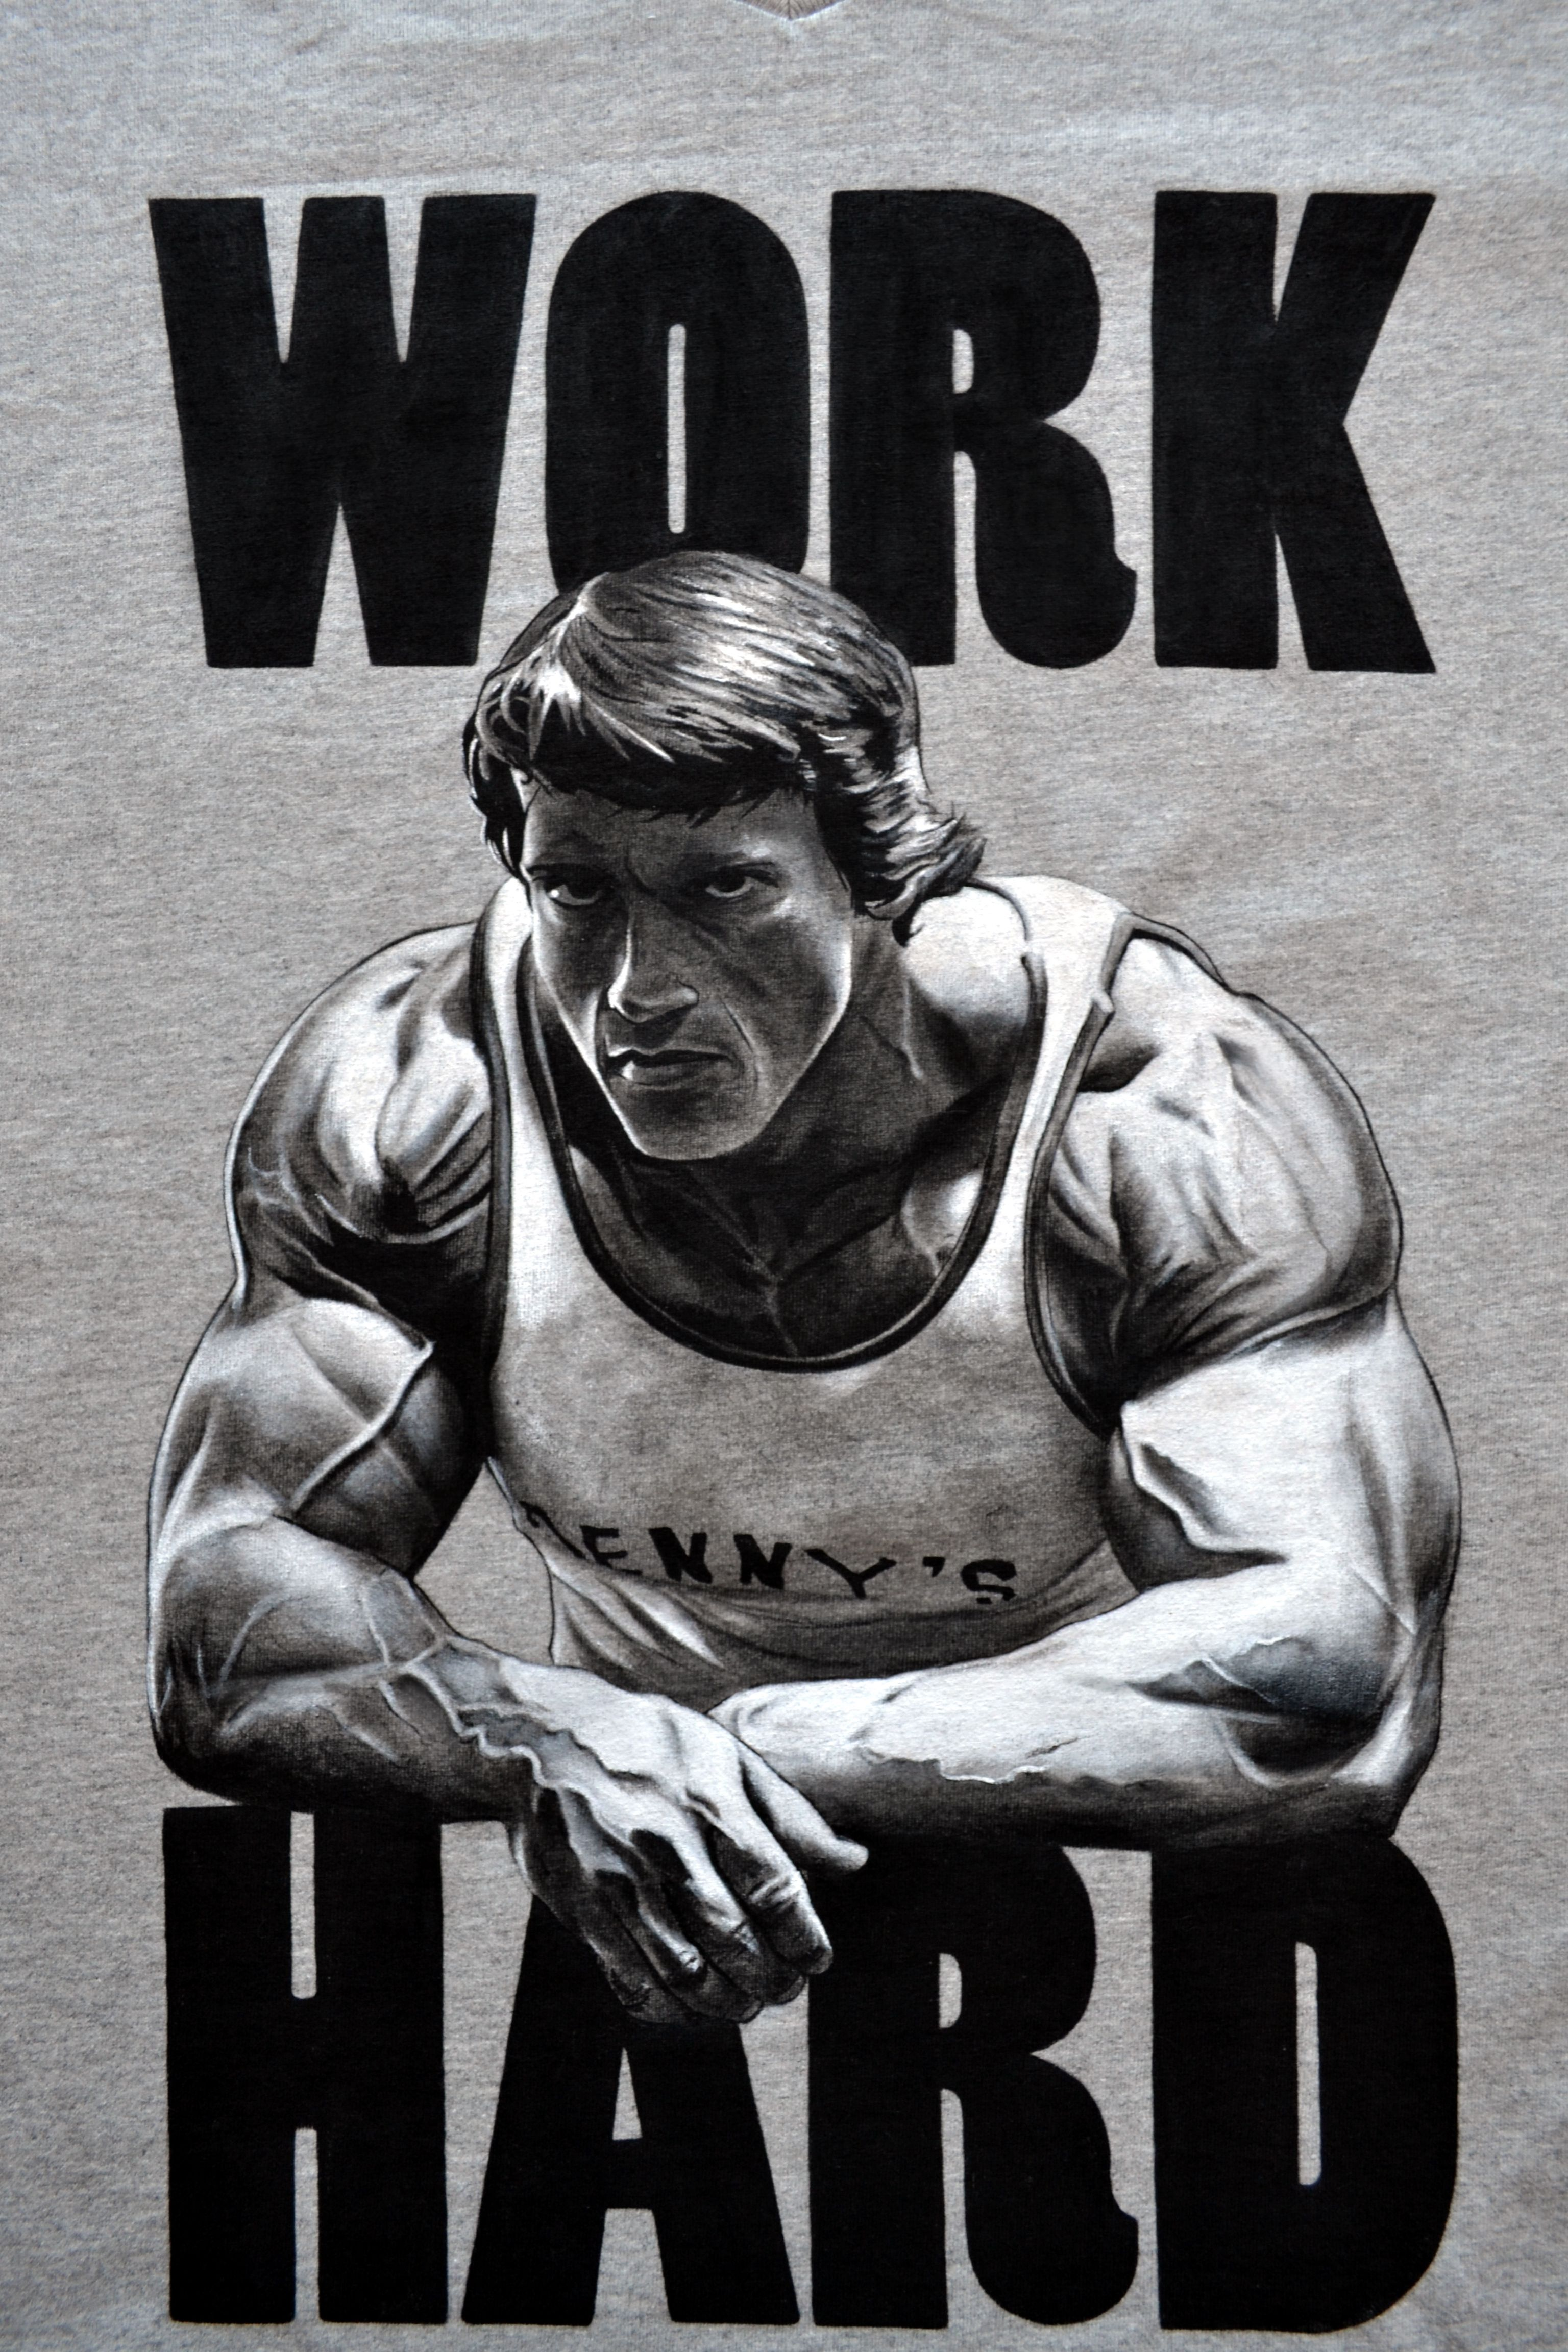 Estampa Arnold Schwarzenegger Work Hard Fitness Motivation Inspiration Fitness Motivation Body Schwarzenegger Bodybuilding